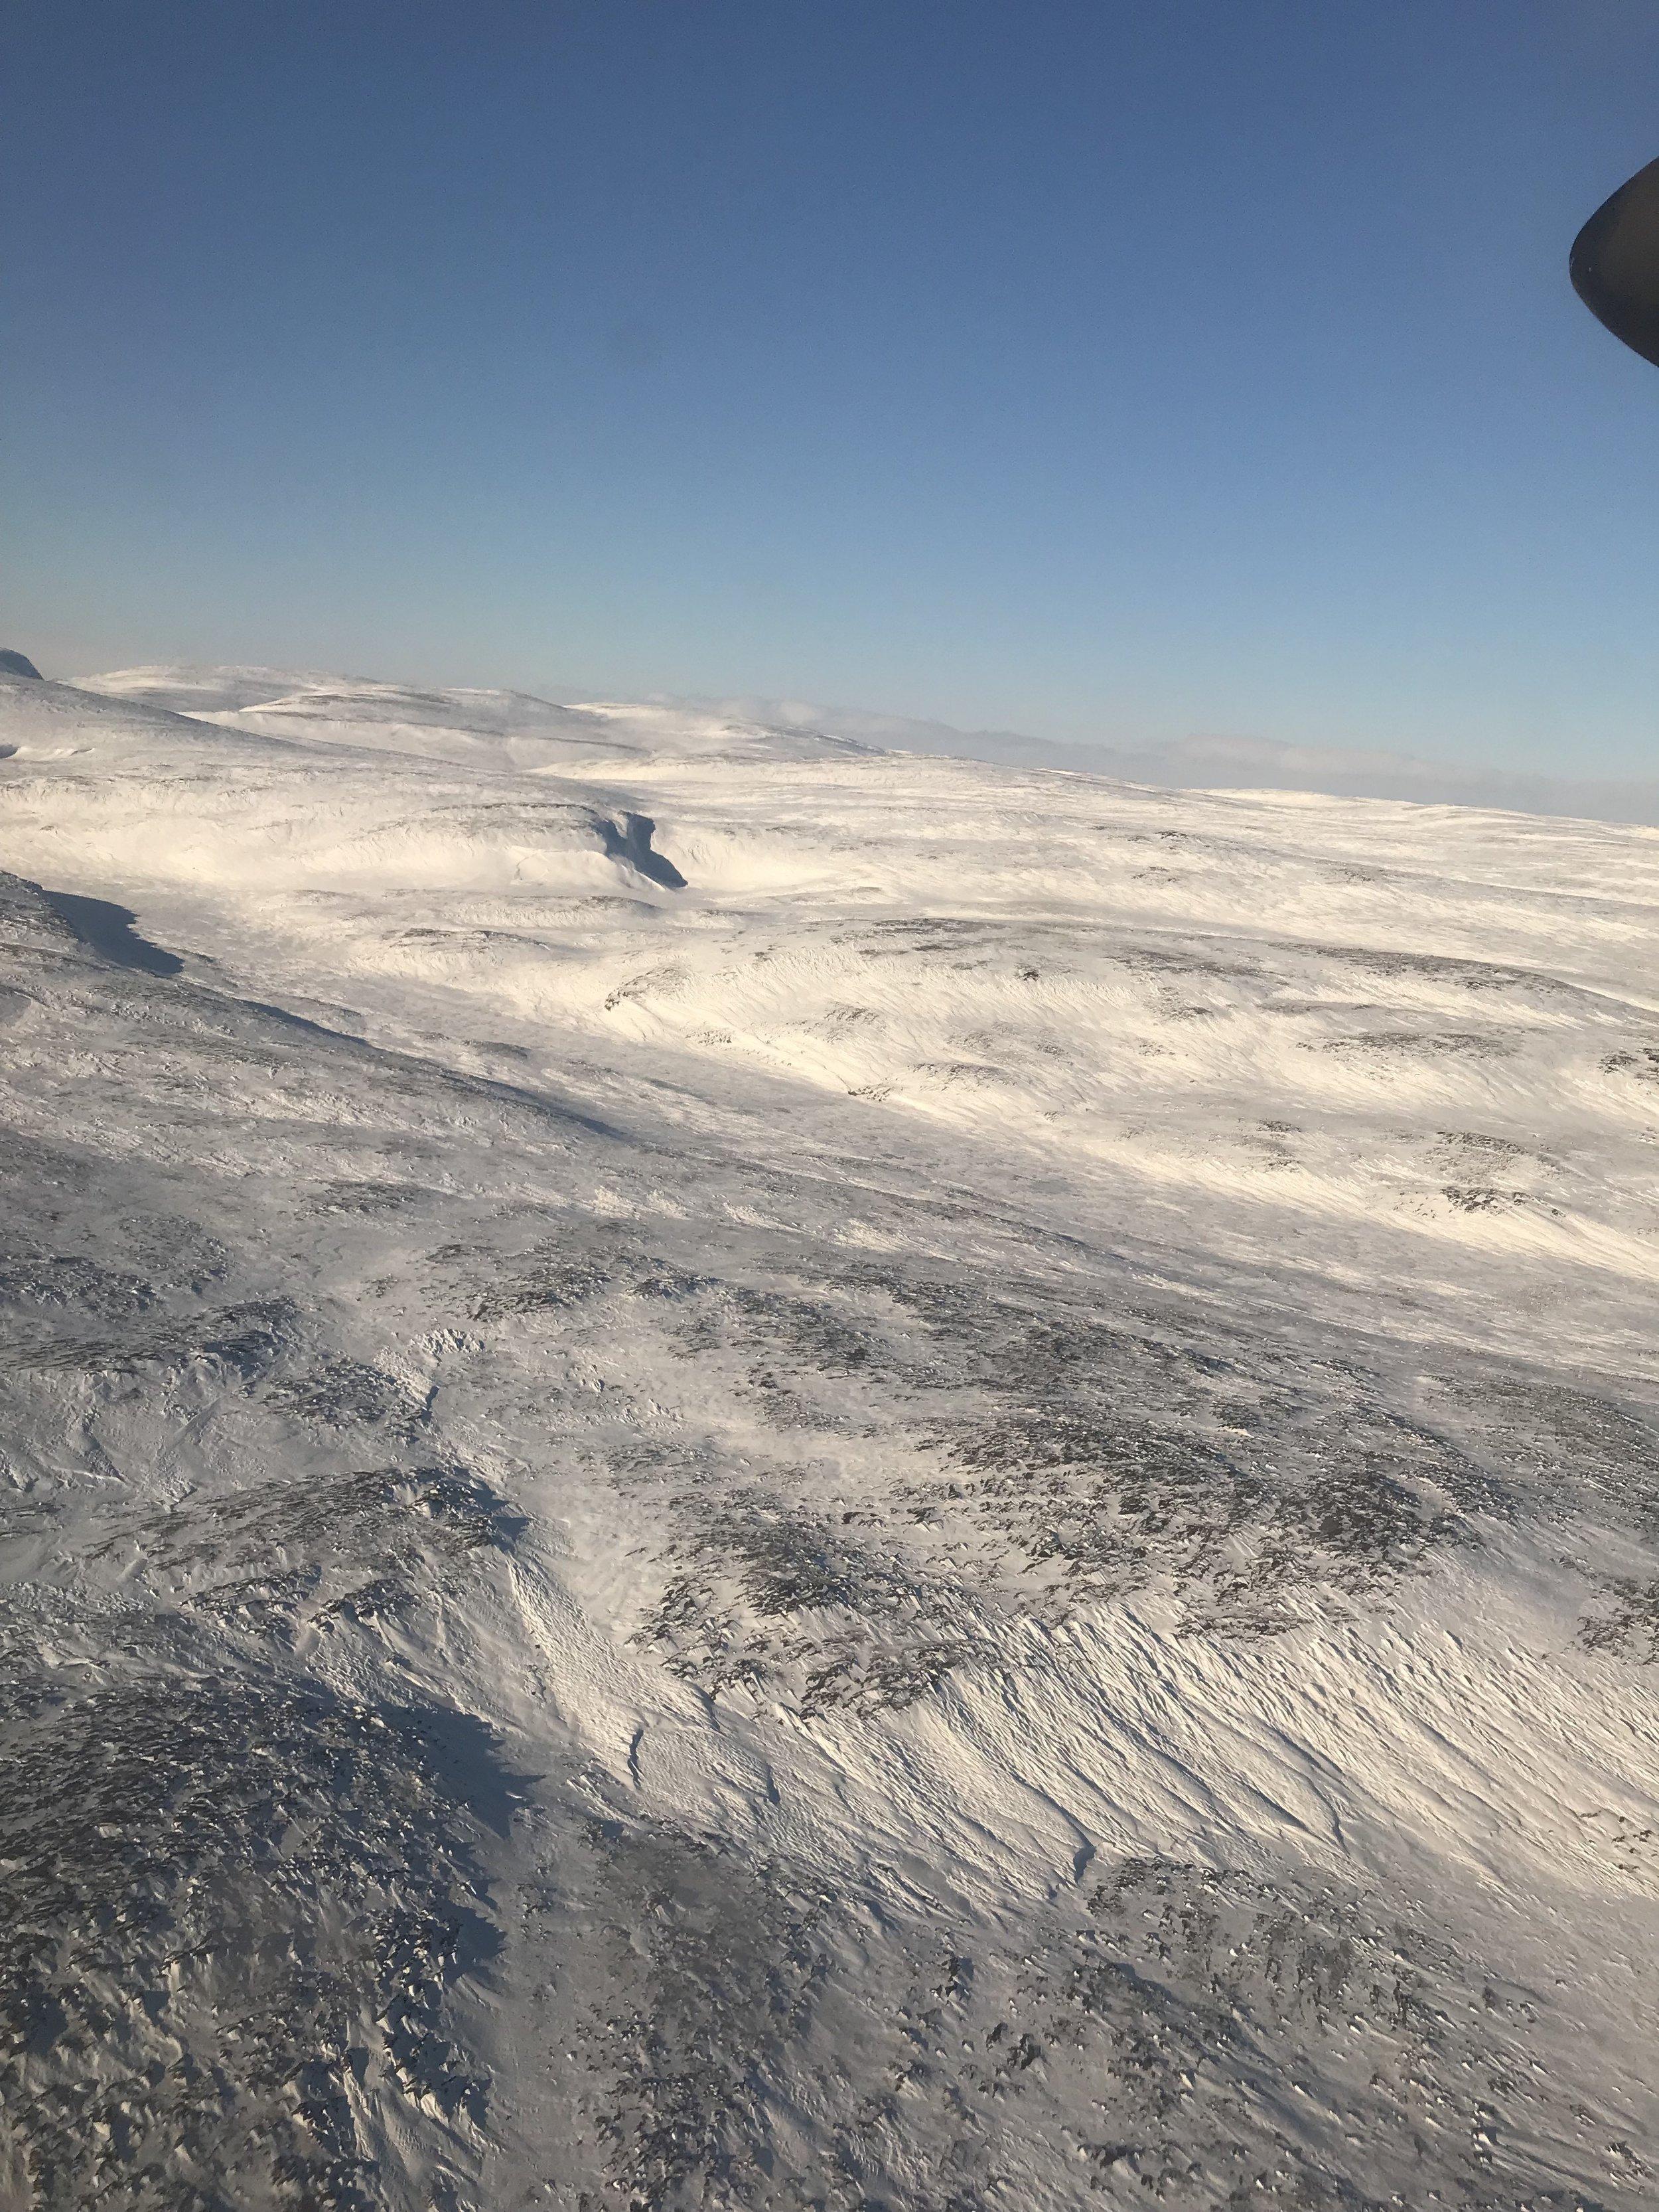 Arriving into Kangiqsujuaq…